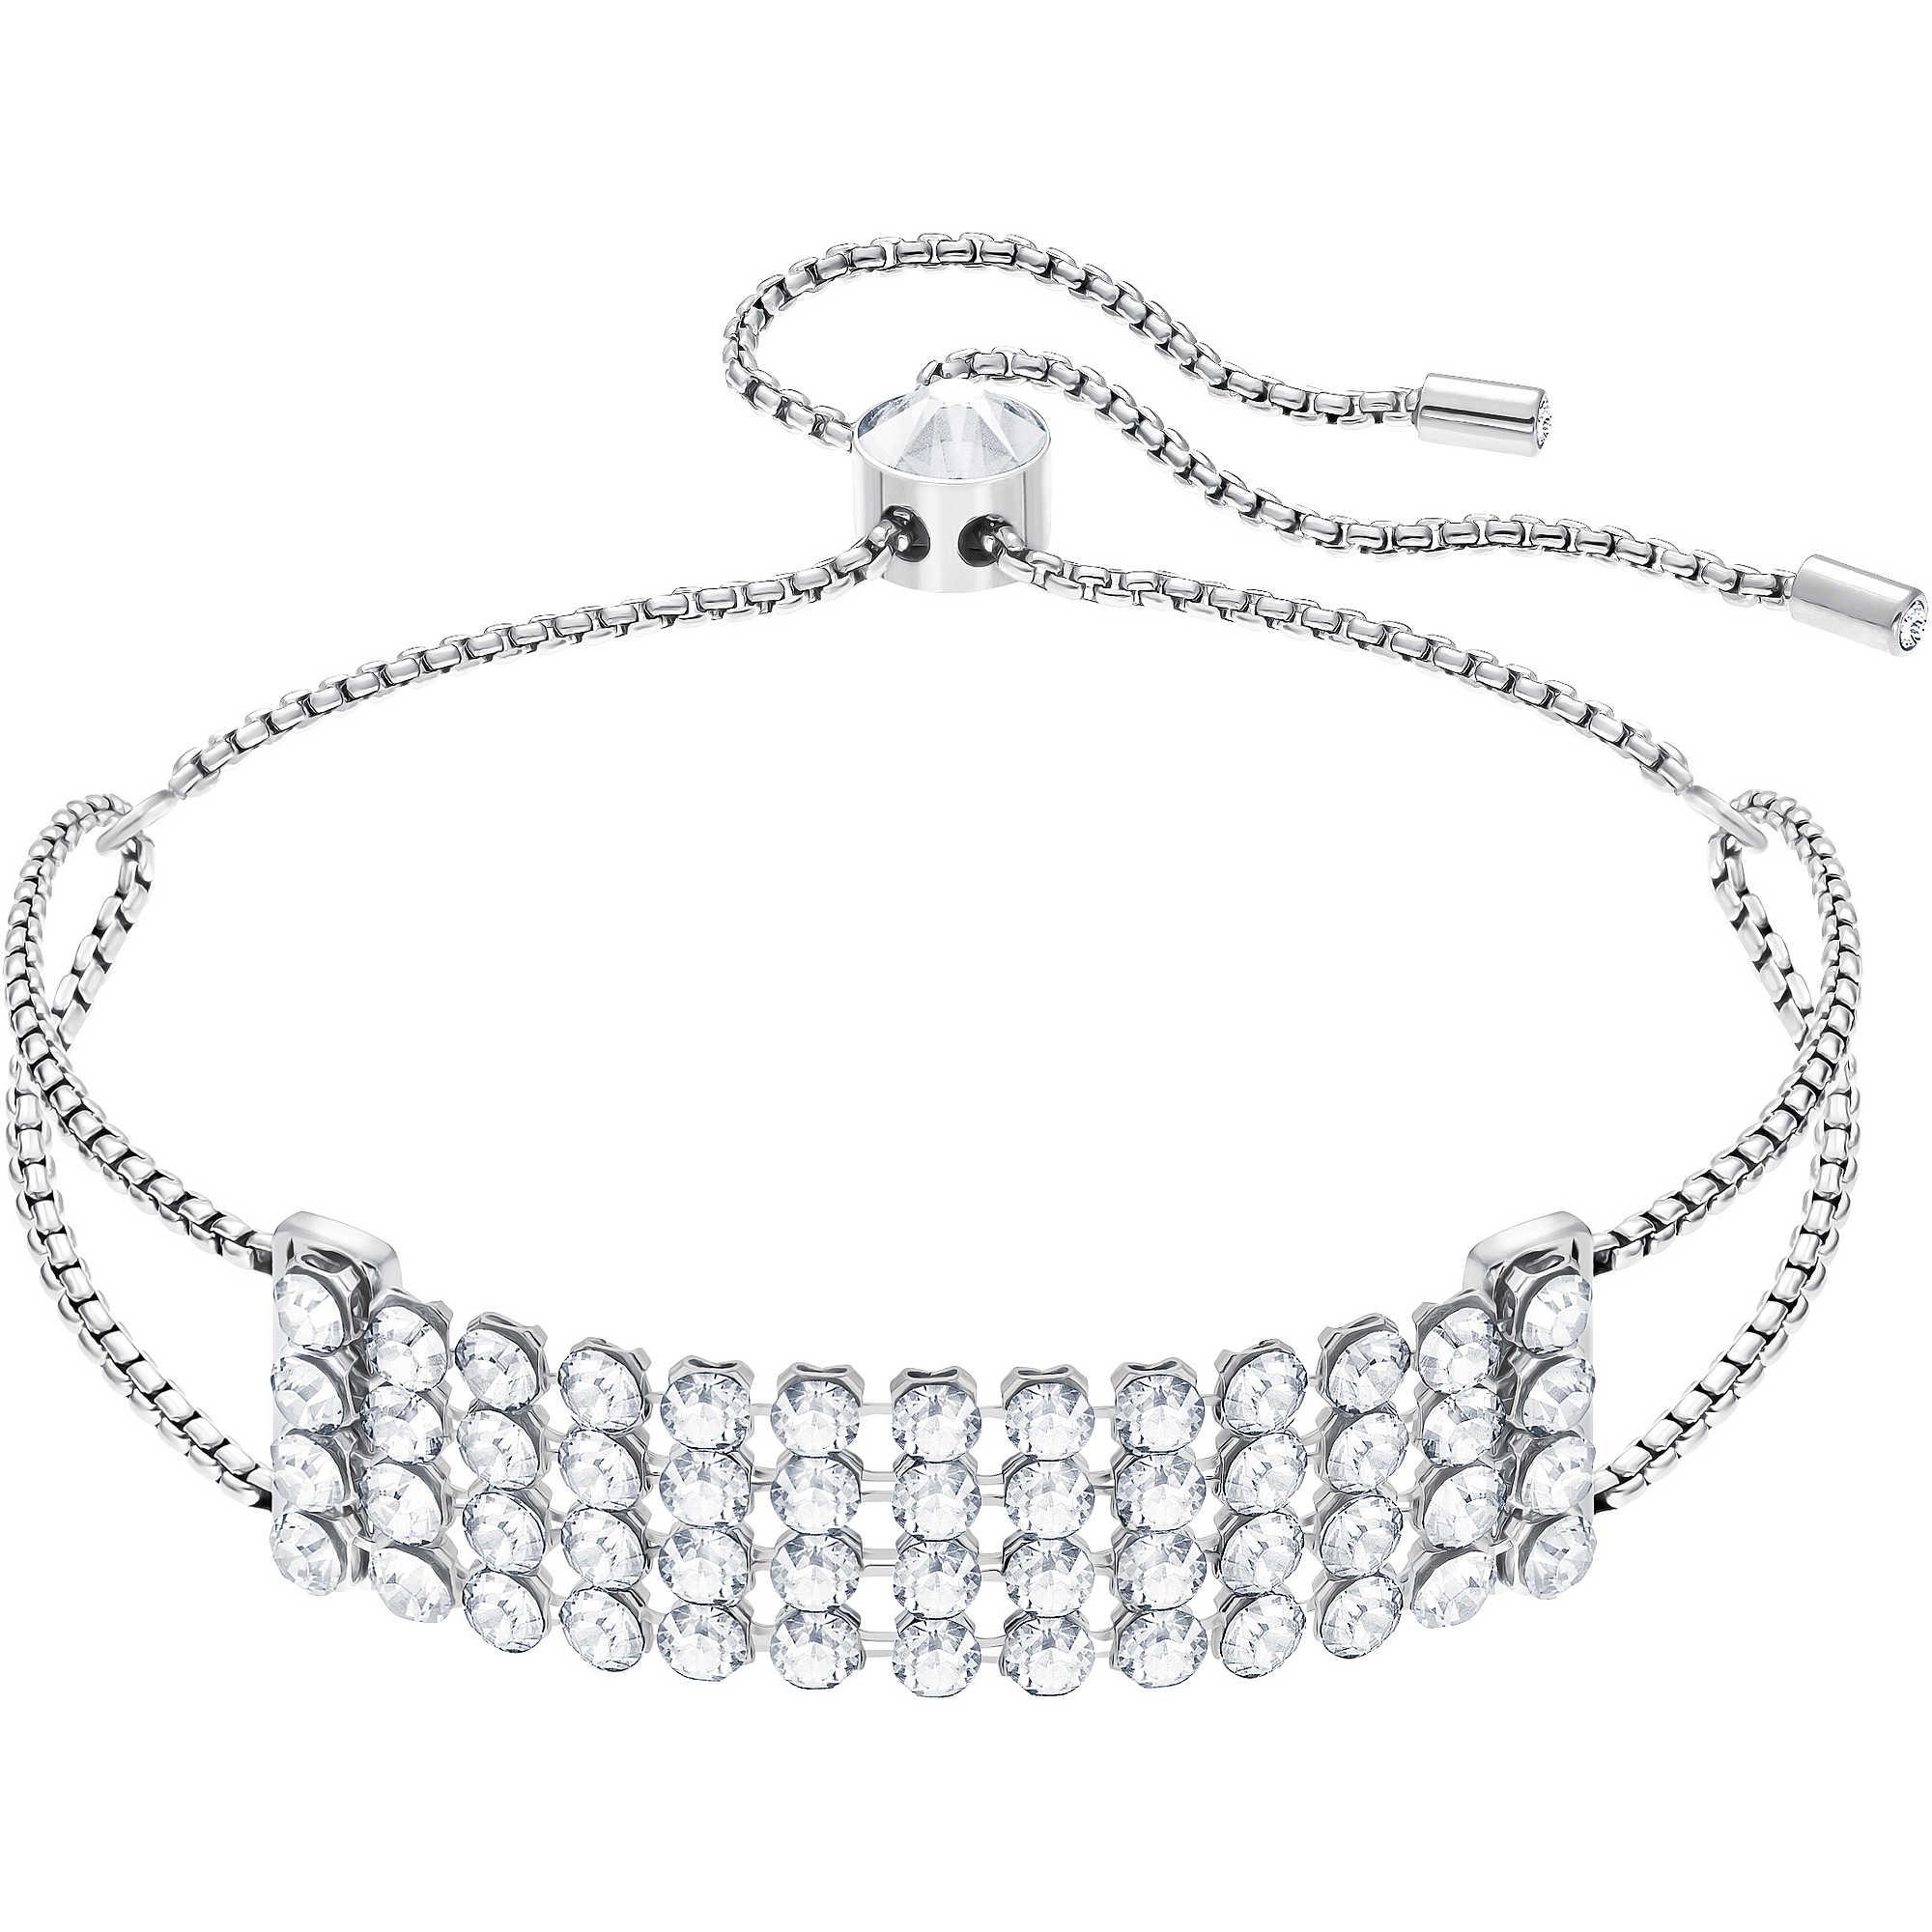 91e4f903e8c6b6 bracciale donna gioielli Swarovski Fit 5386194 bracciali Swarovski